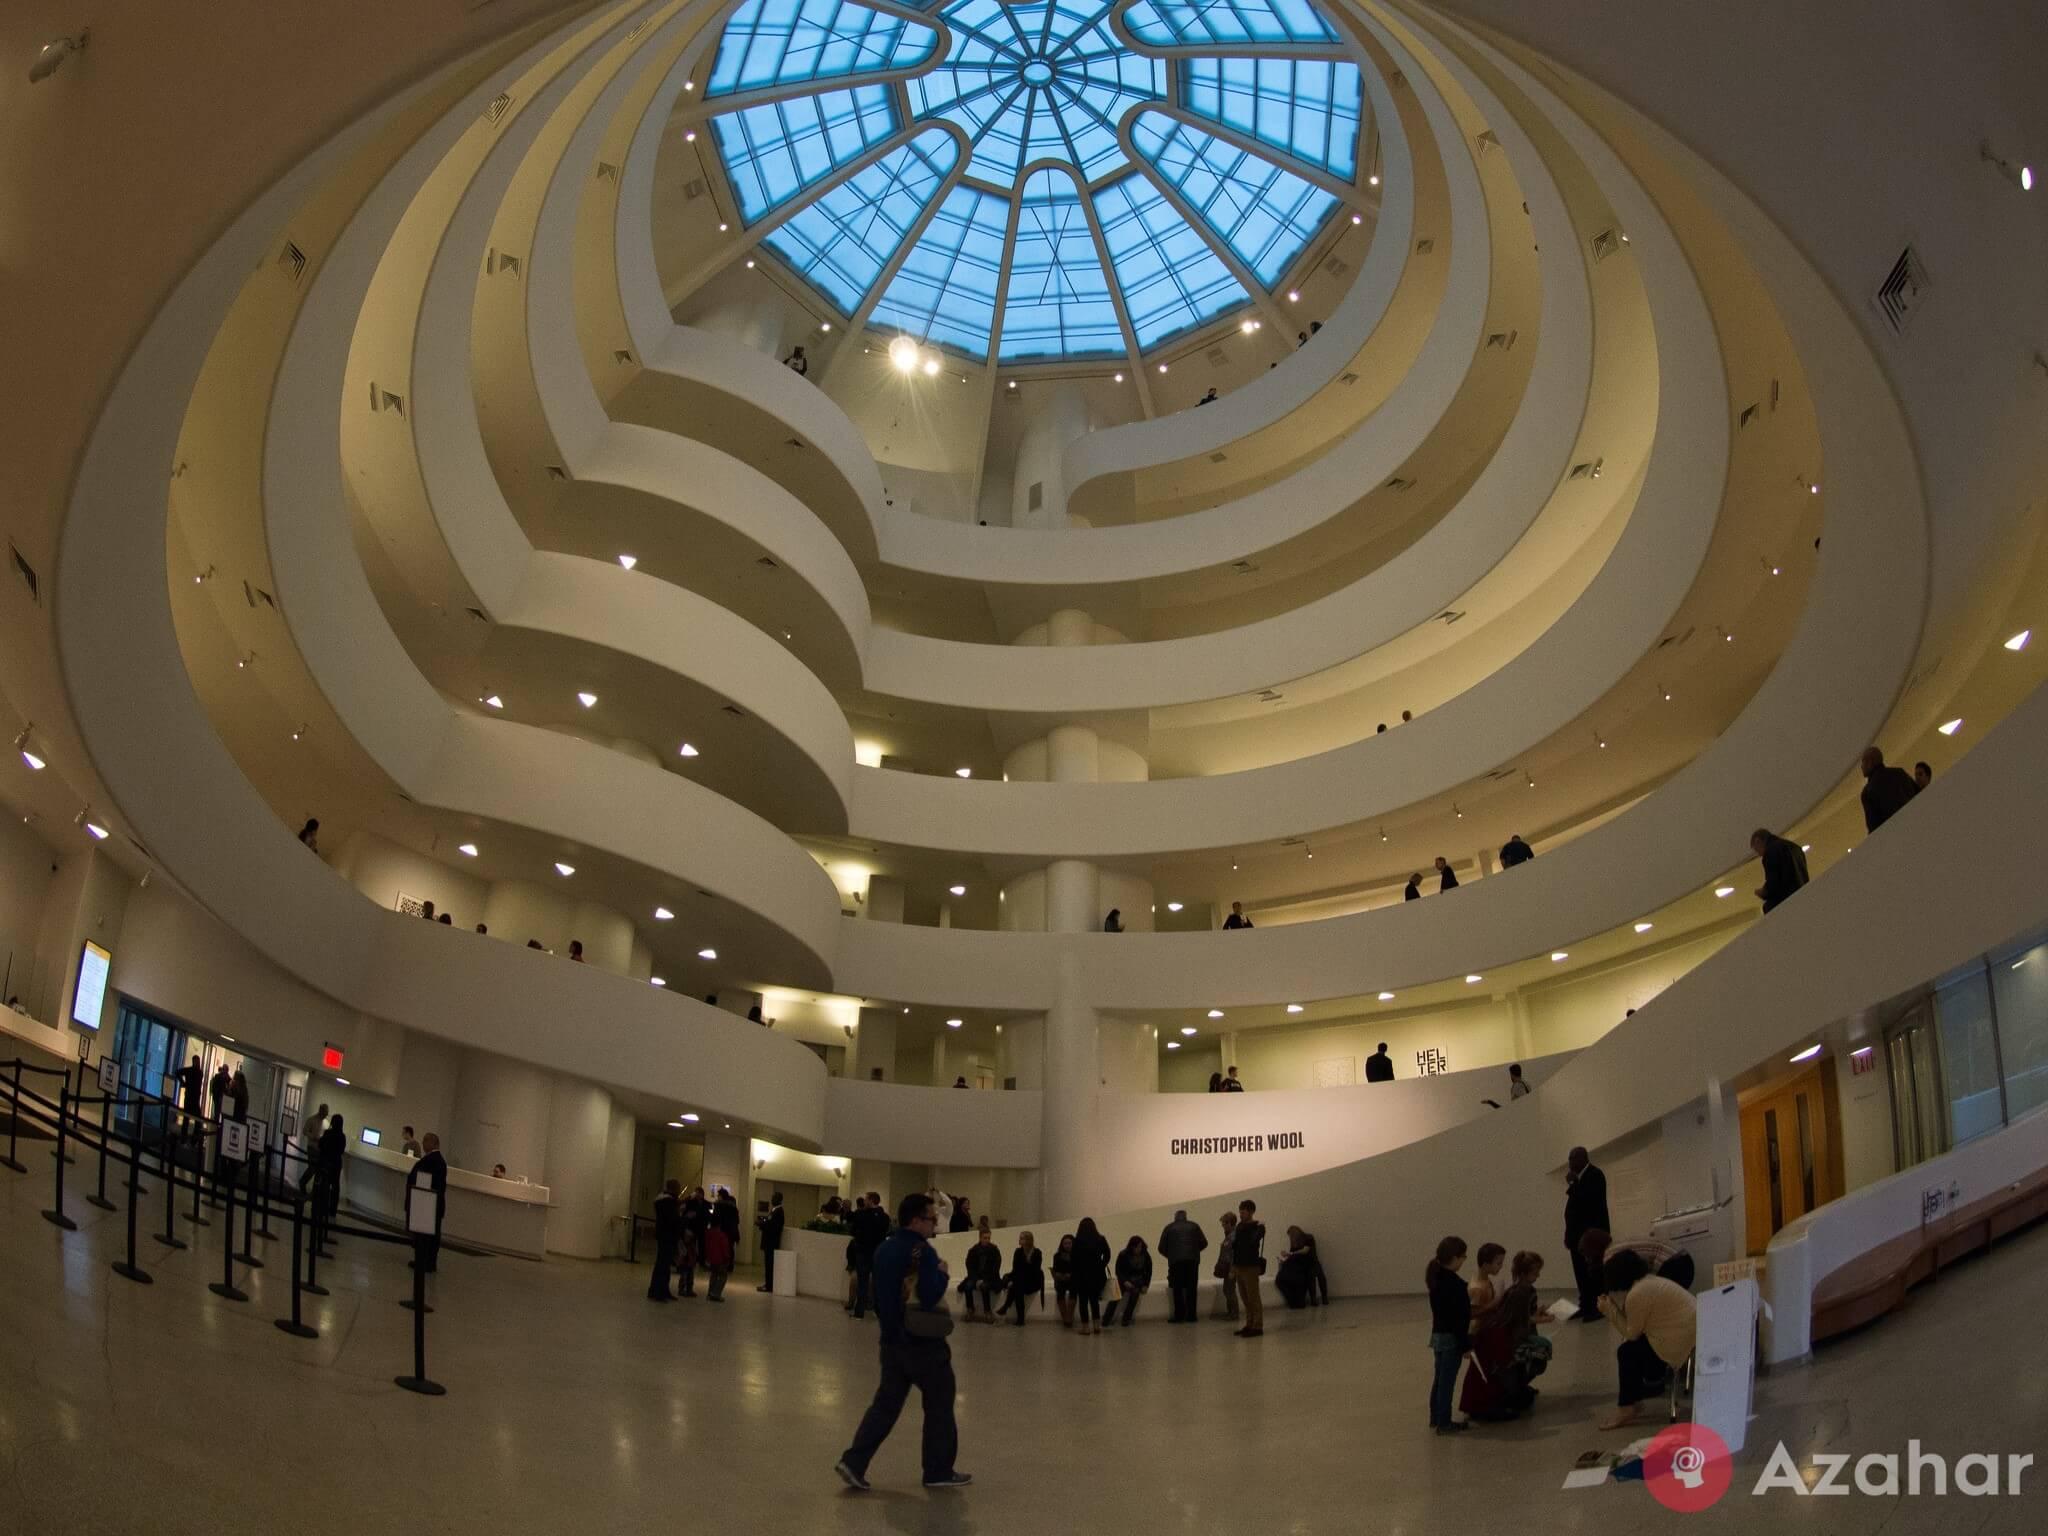 The Solomon R. Guggenheim Museum, New York